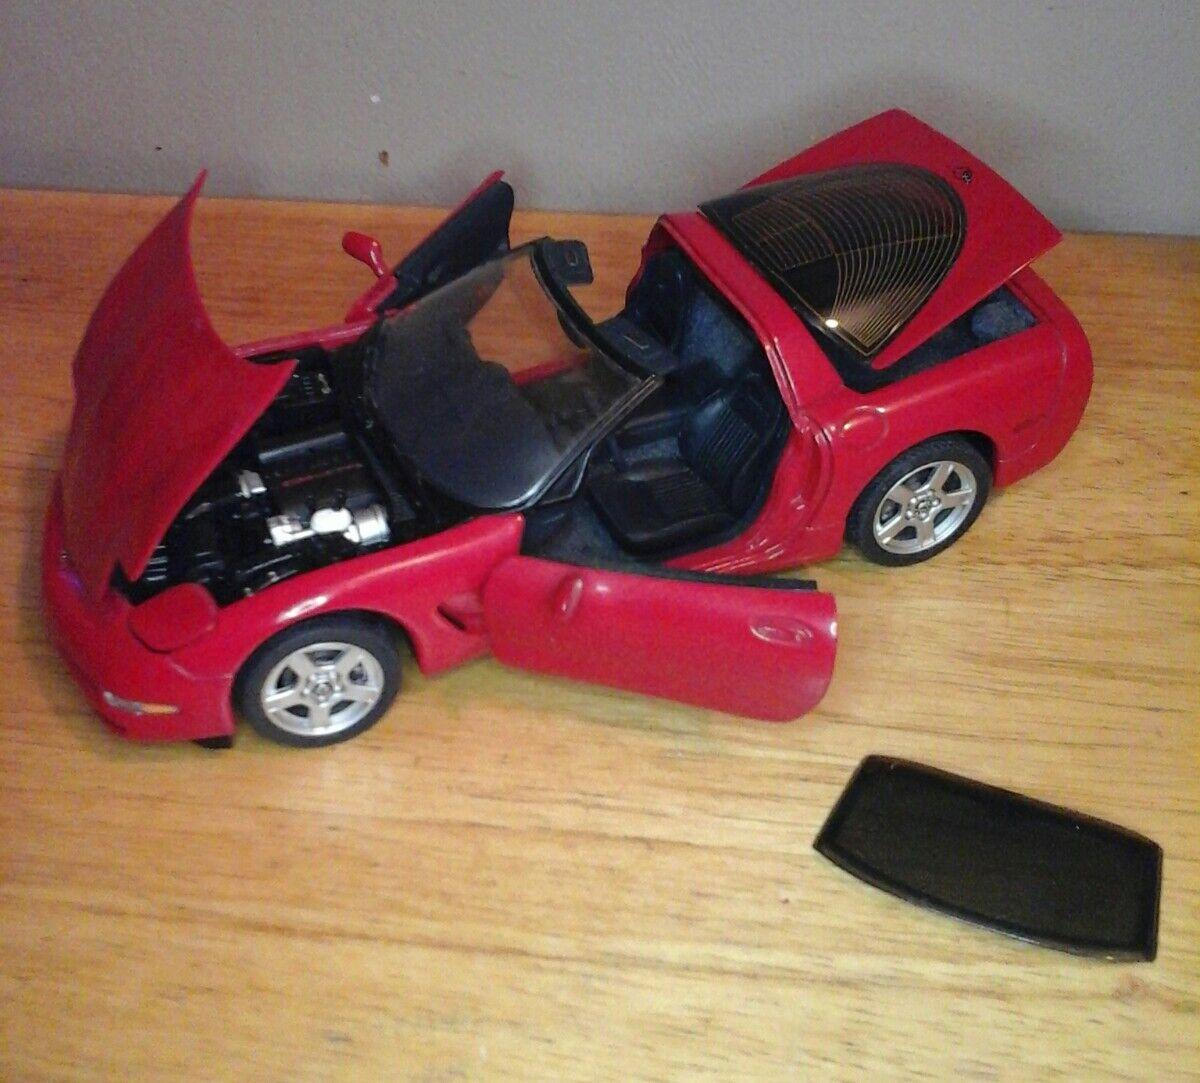 FRANKLIN MINT 1997 CORVETTE rojo 1 24 DIECAST CAR VERY DETAILED AWESOME